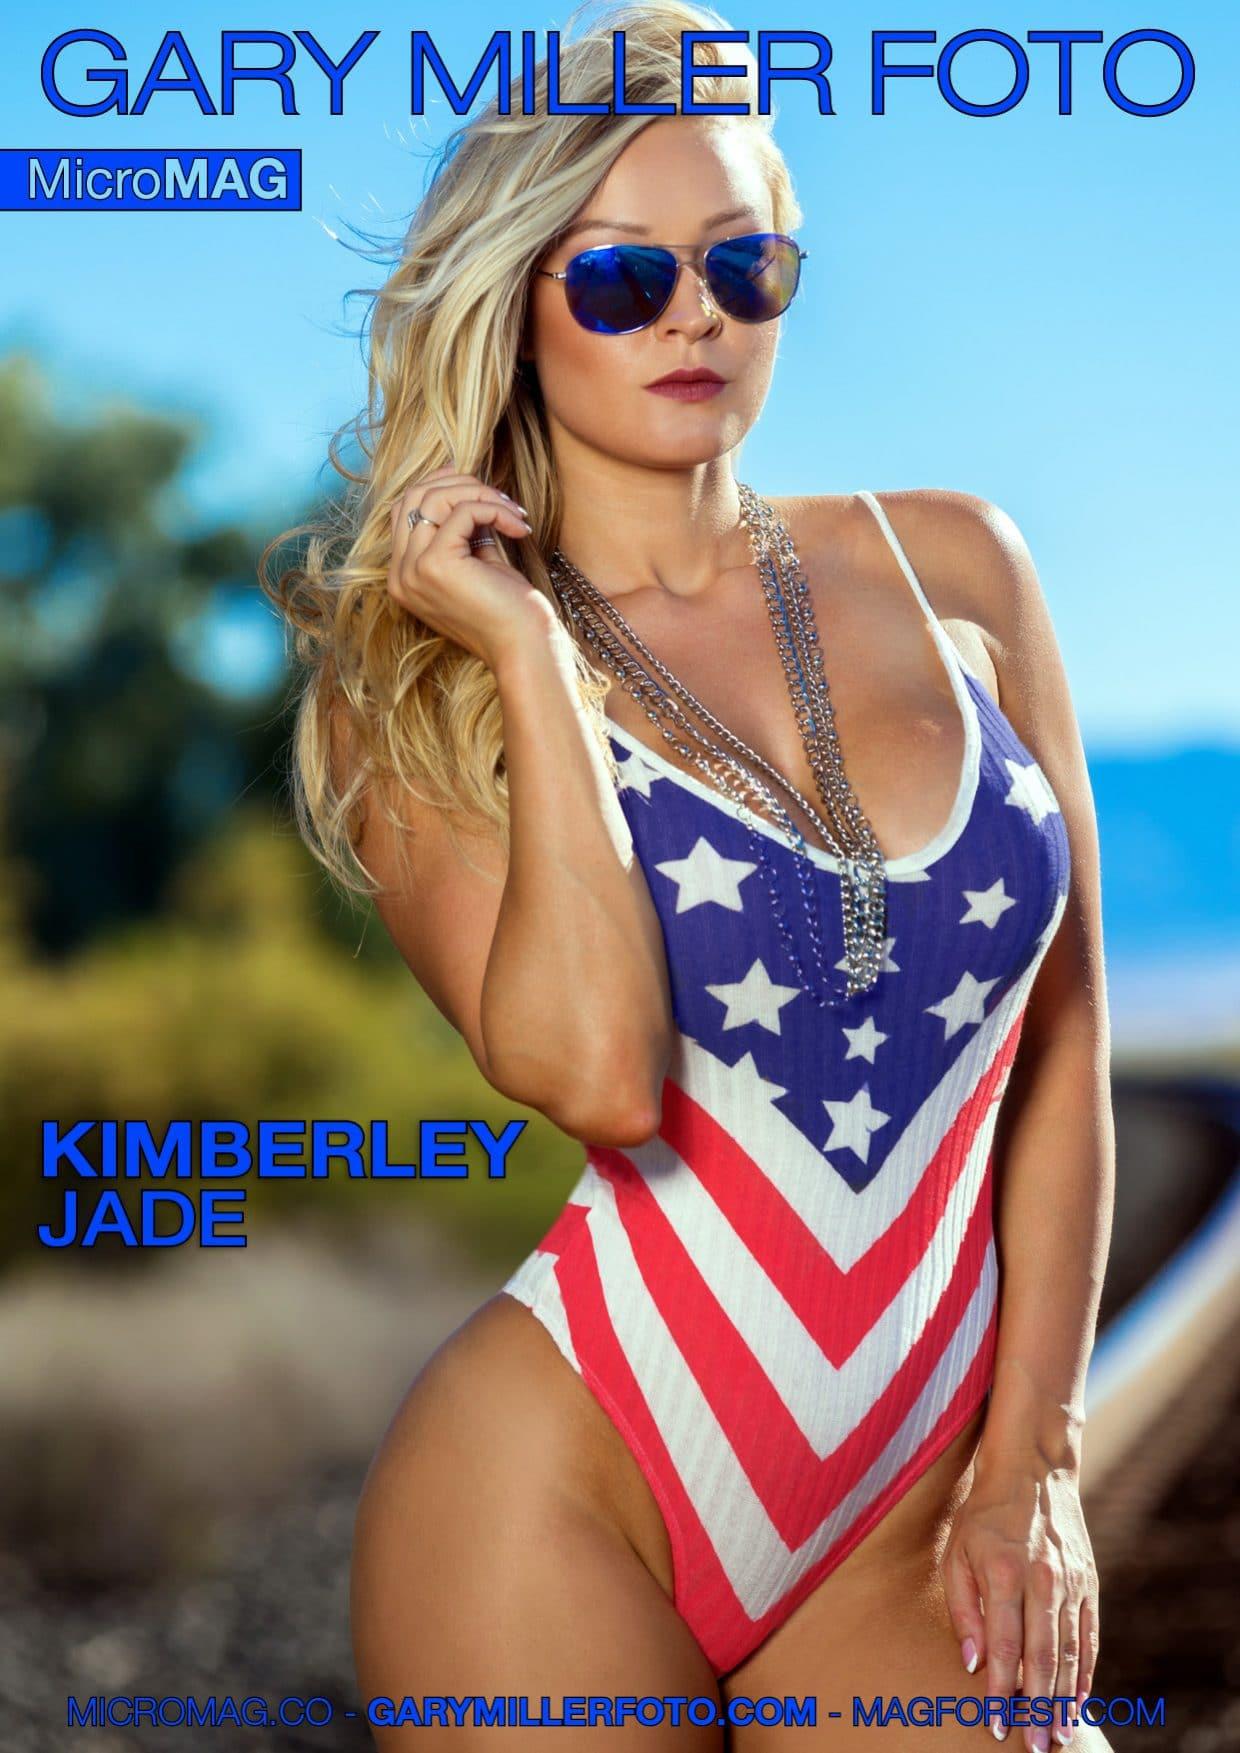 Gary Miller Foto MicroMag - Kimberley Jade 1